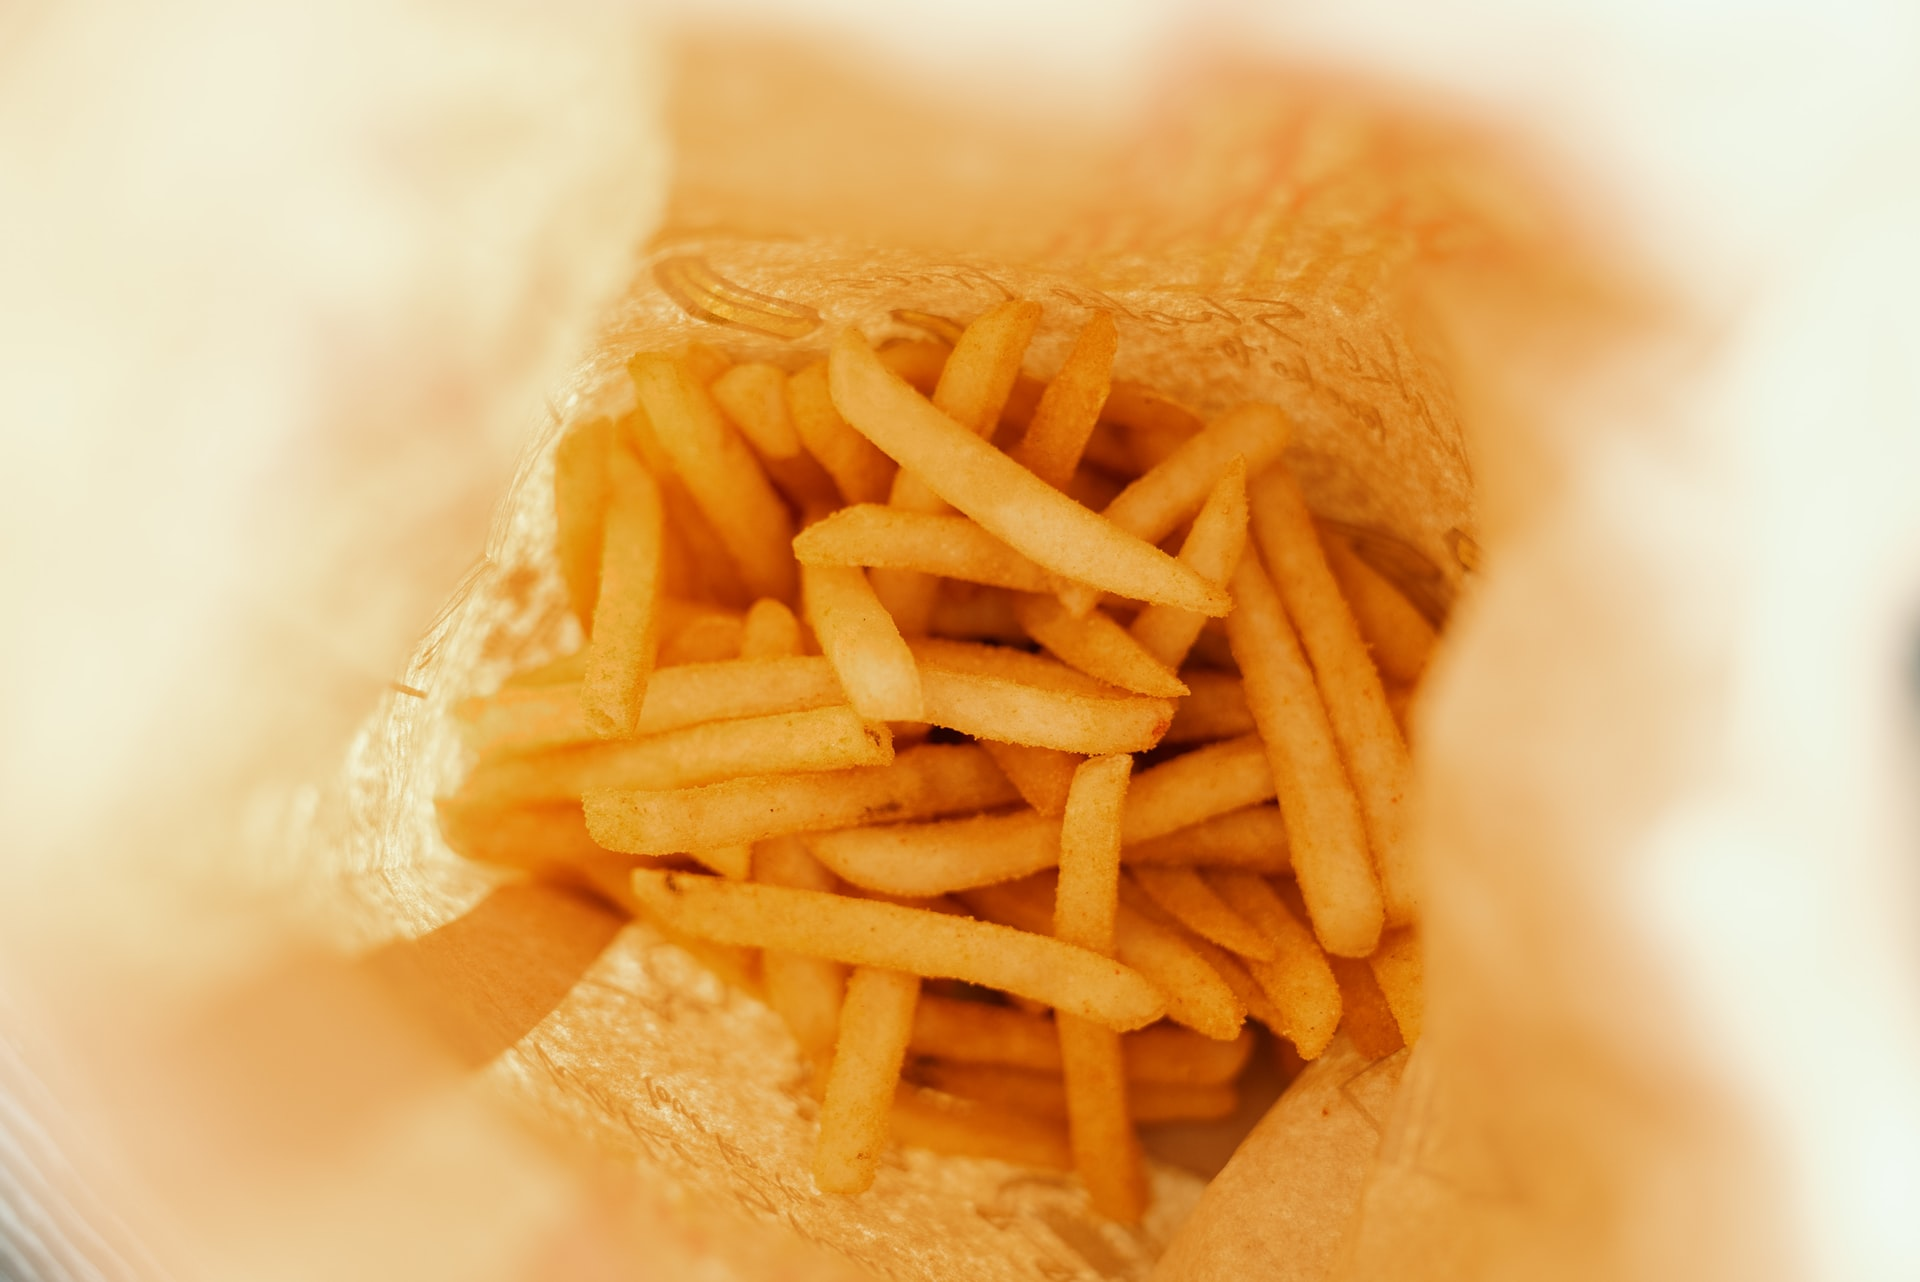 Deretan Fakta BTS Meal, Kolaborasi Spesial McDonald's dan BTS